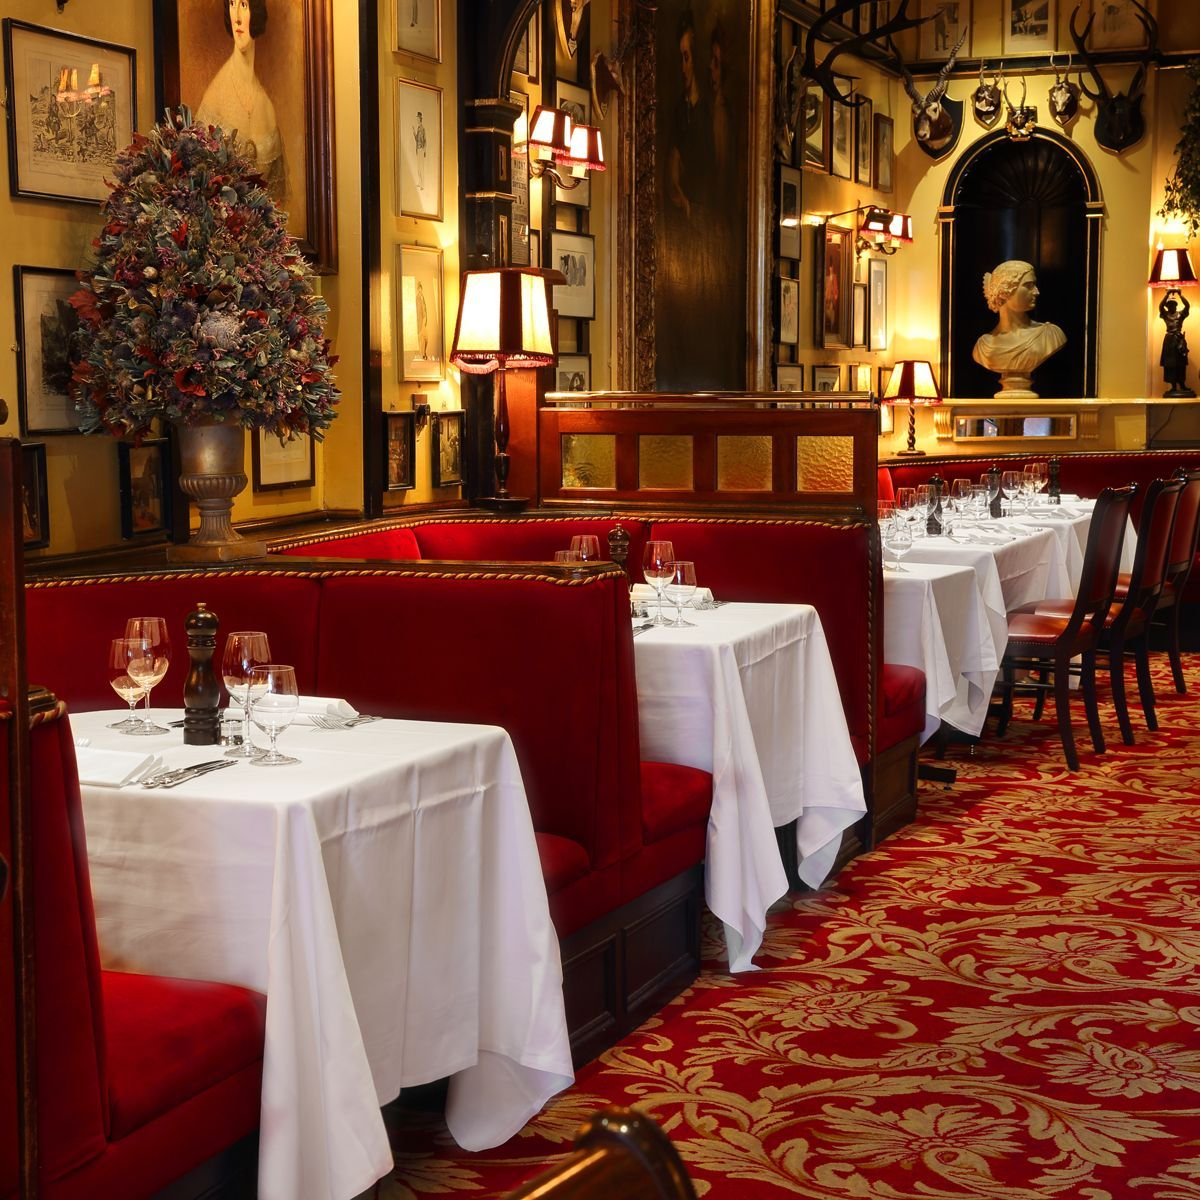 картинки английского ресторана